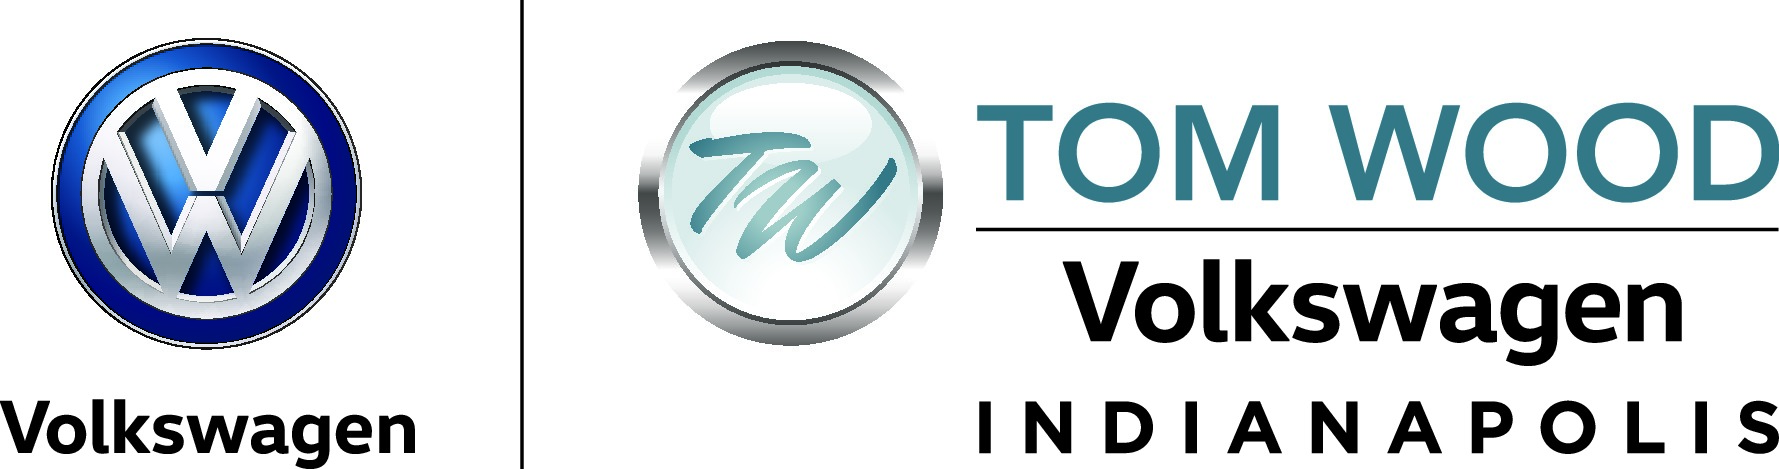 TW-Volkswagen-IndianapolisVW-Bug.eps (1)